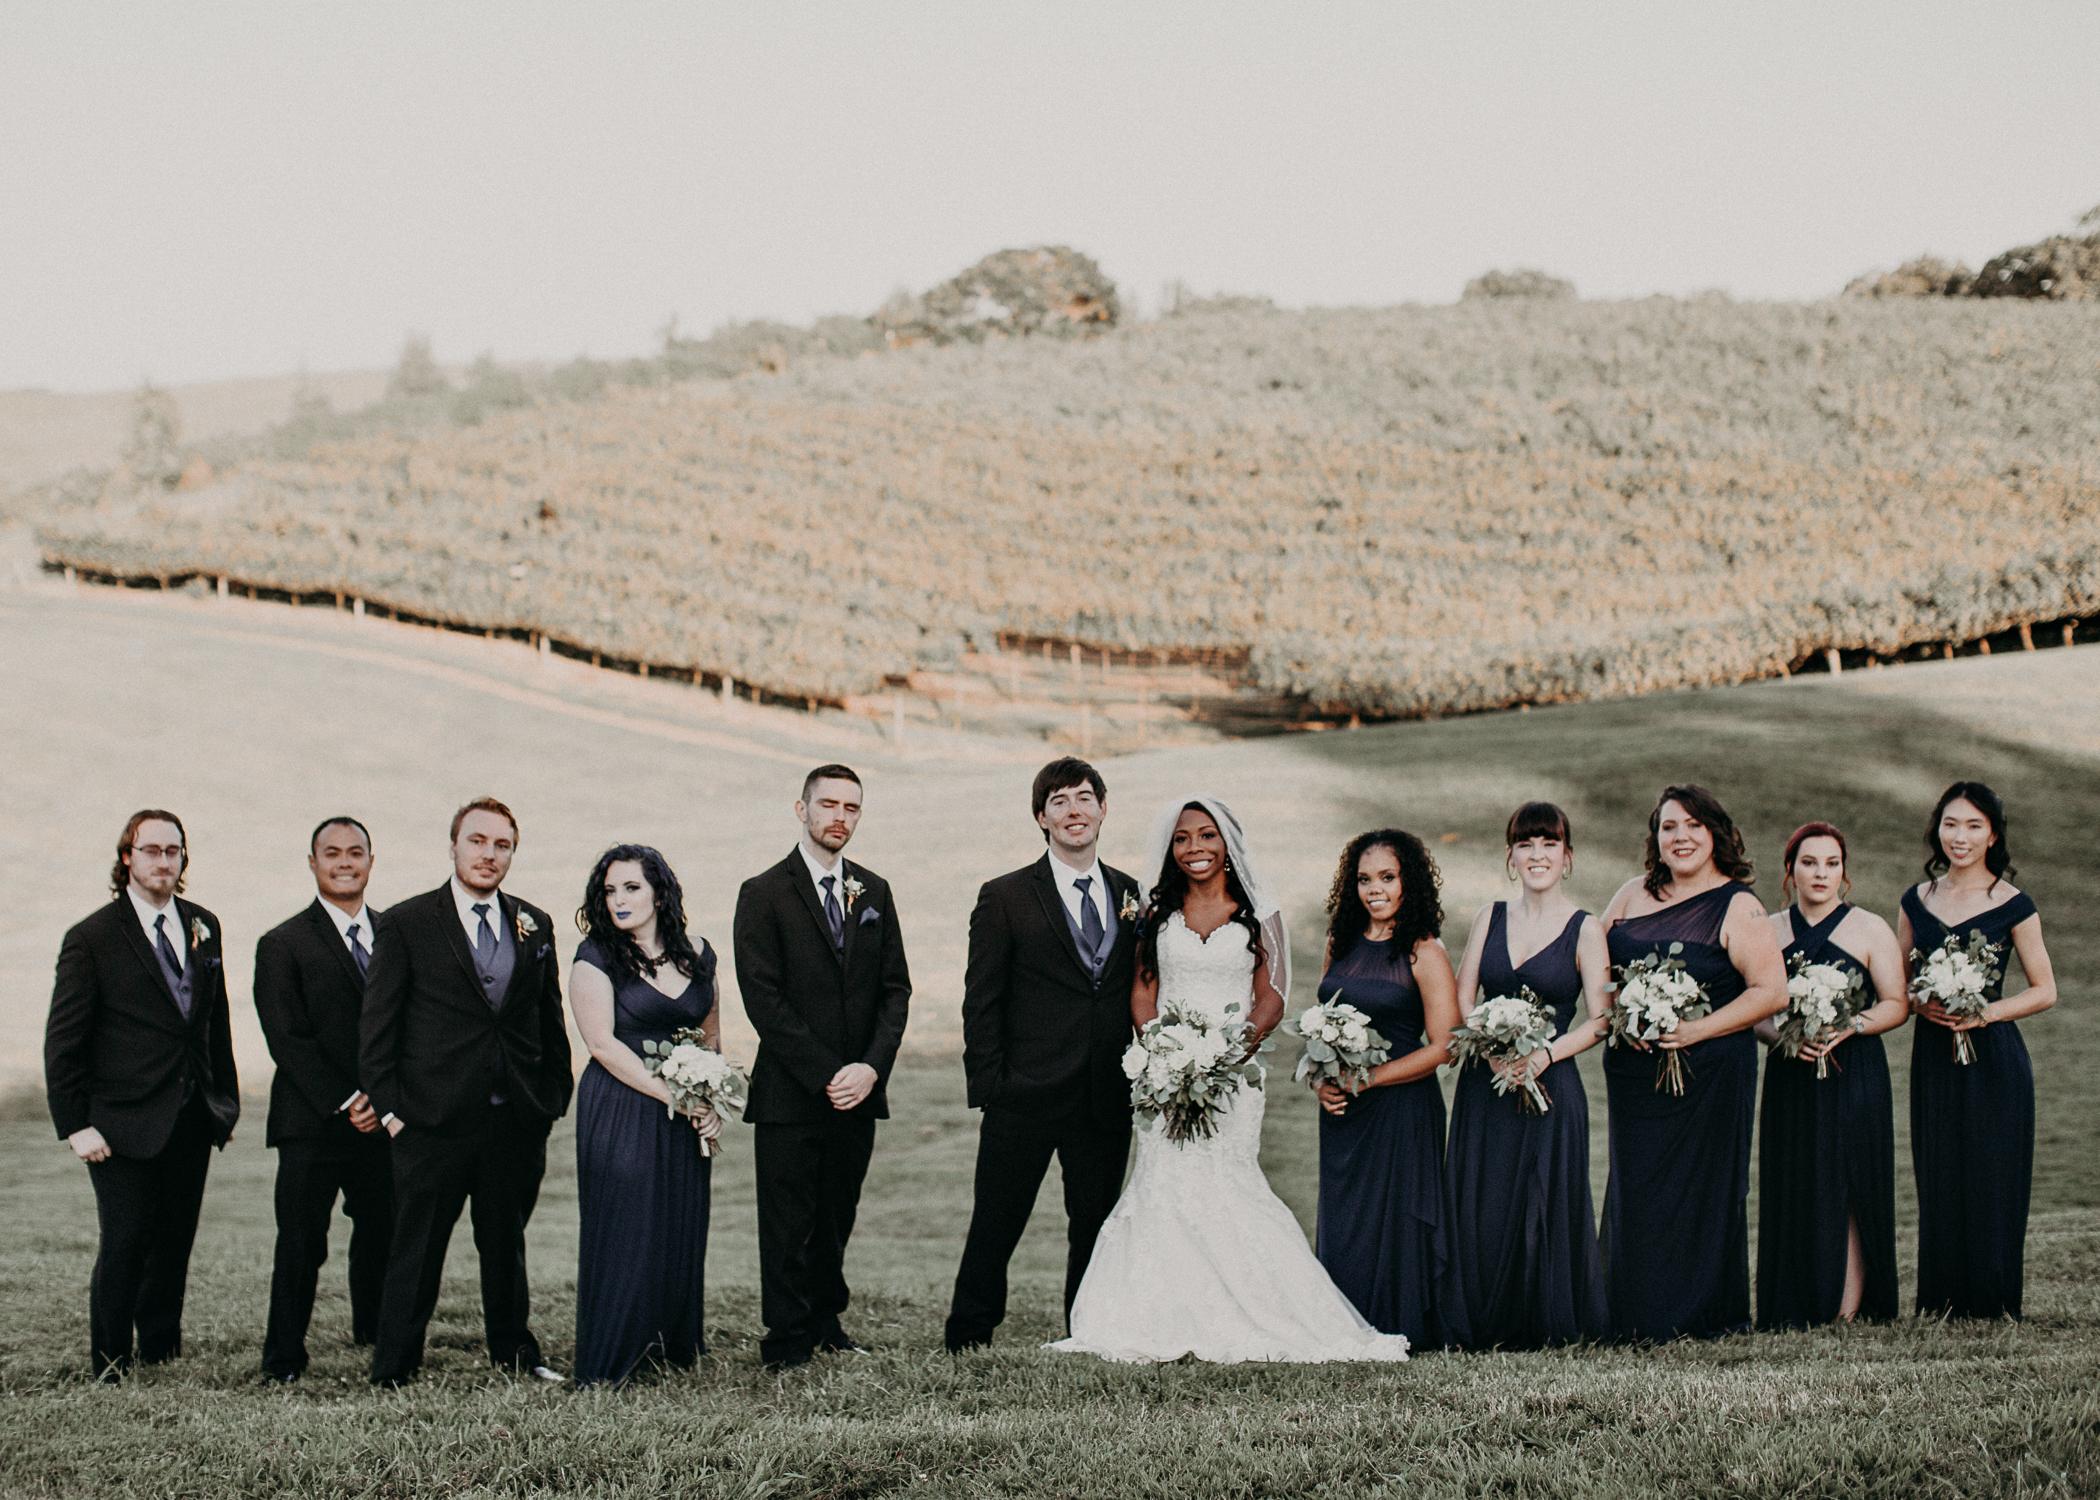 49- Kaya_vineyard_dahlonega_wedding_venue_bridal_party_portraits_aline_marin_photography.jpg